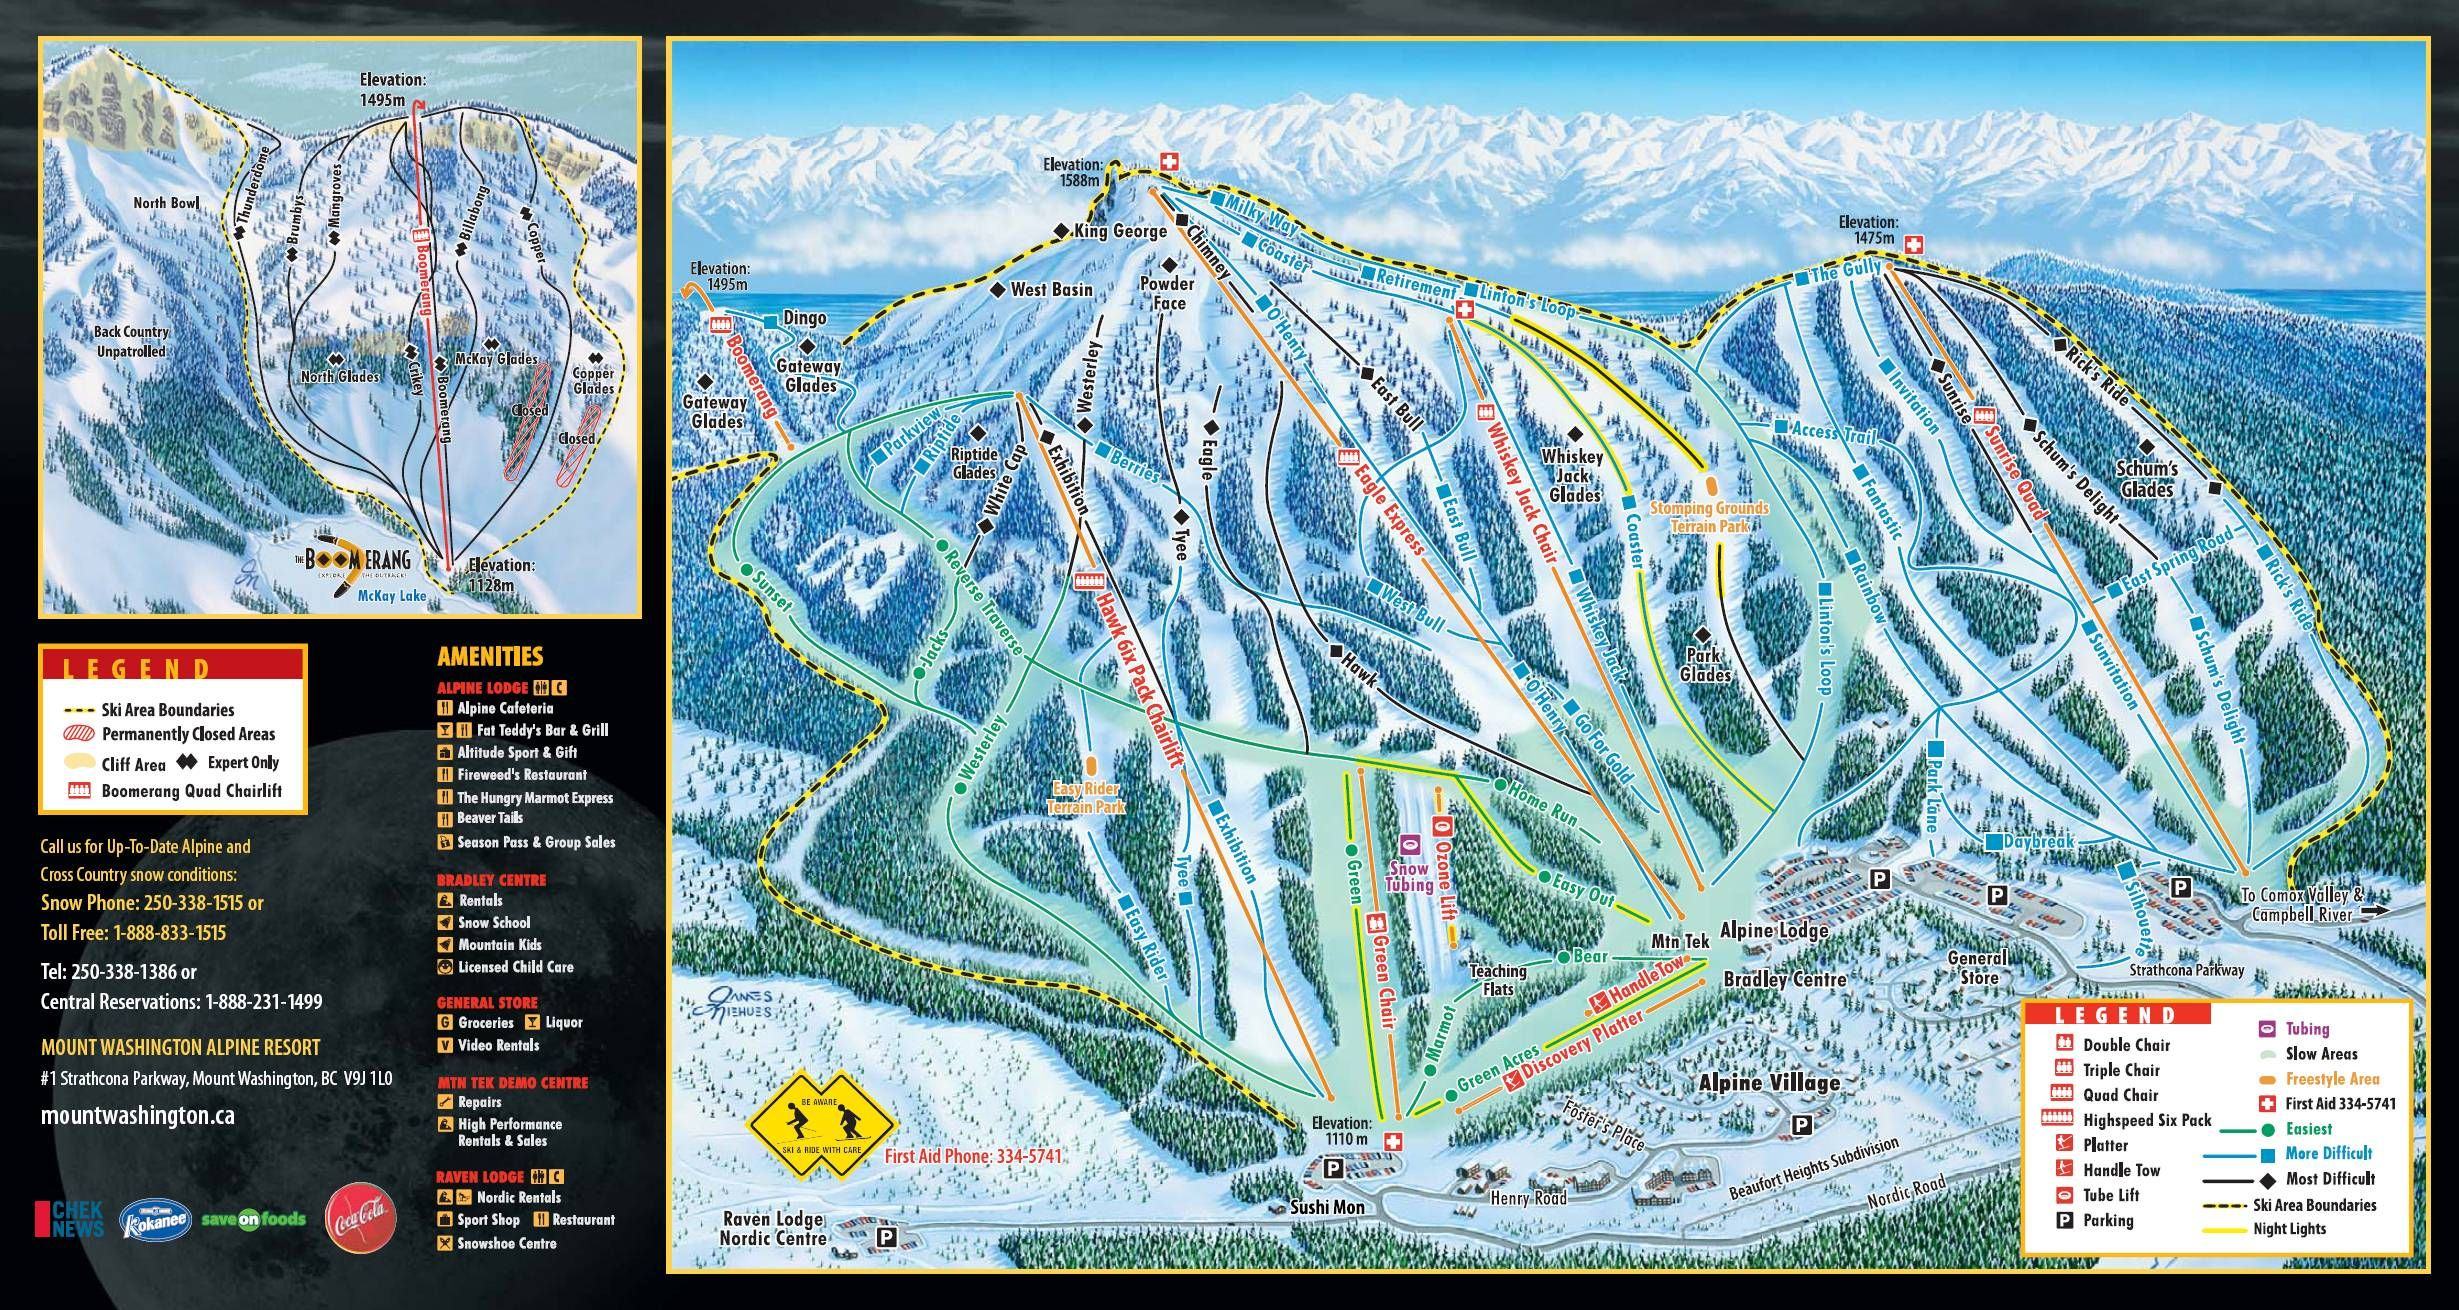 Mt Washington Lodging Mt Washington trail map